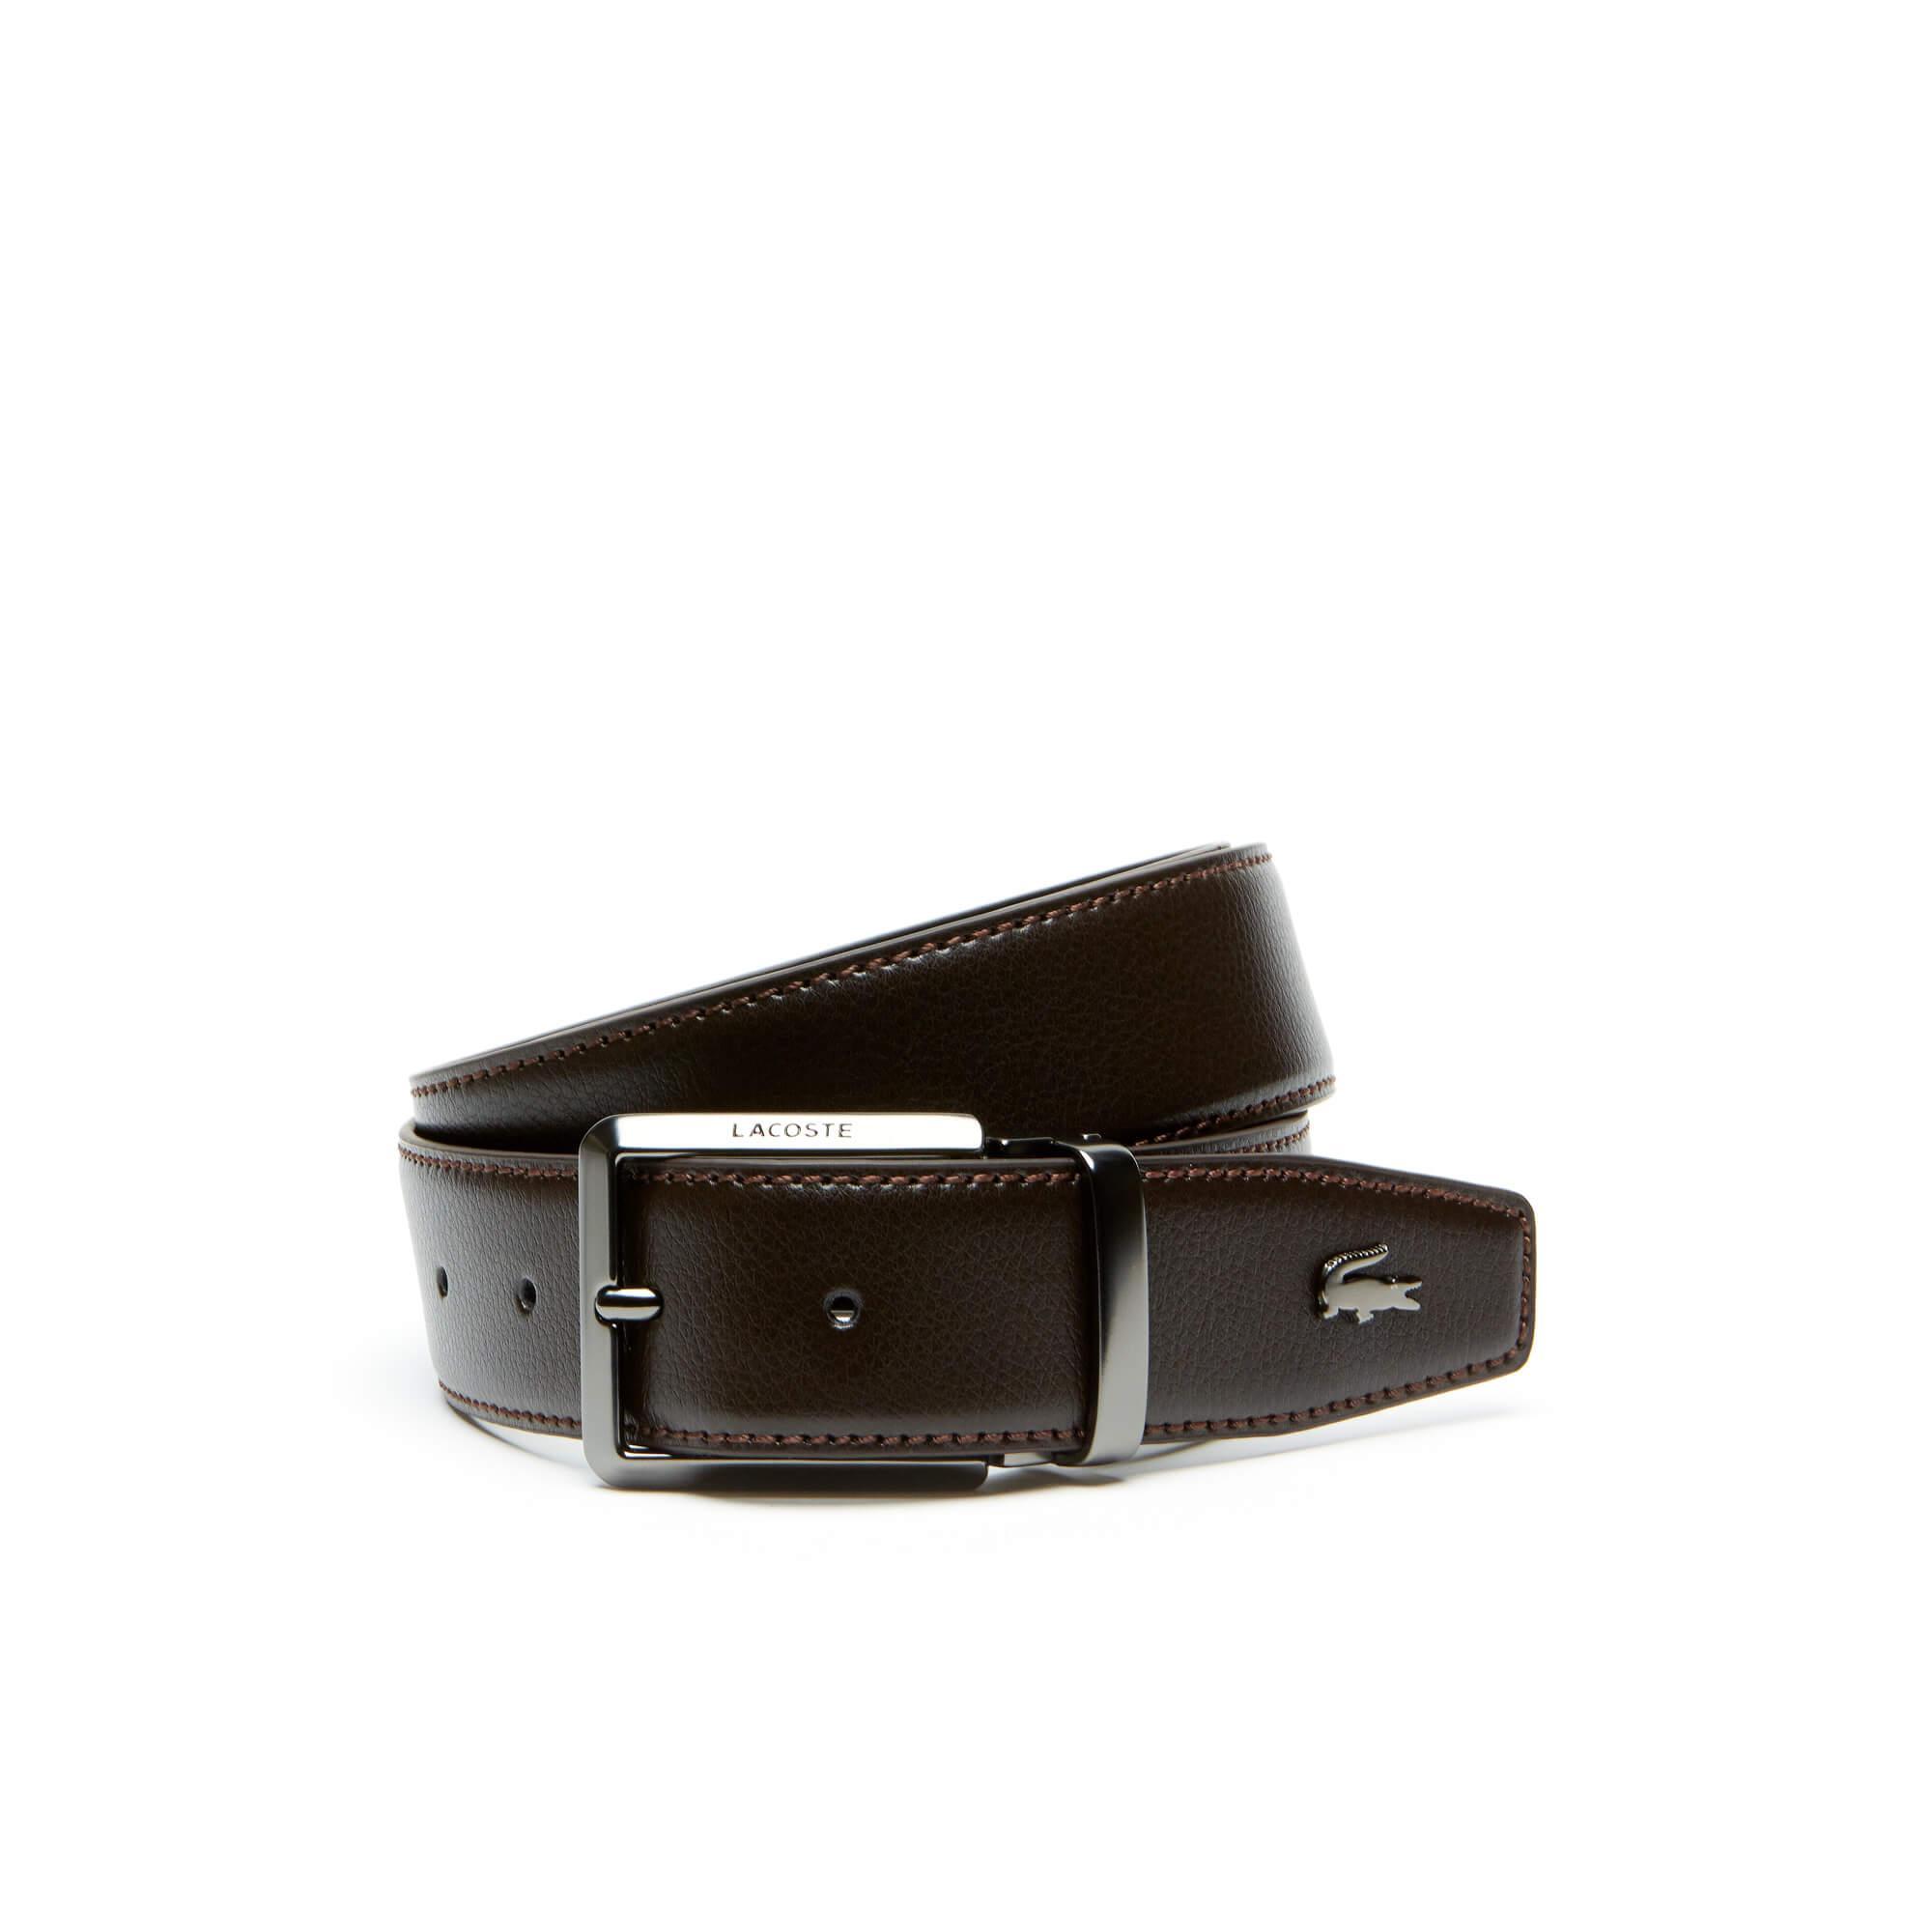 Lacoste Men's Leather Belt